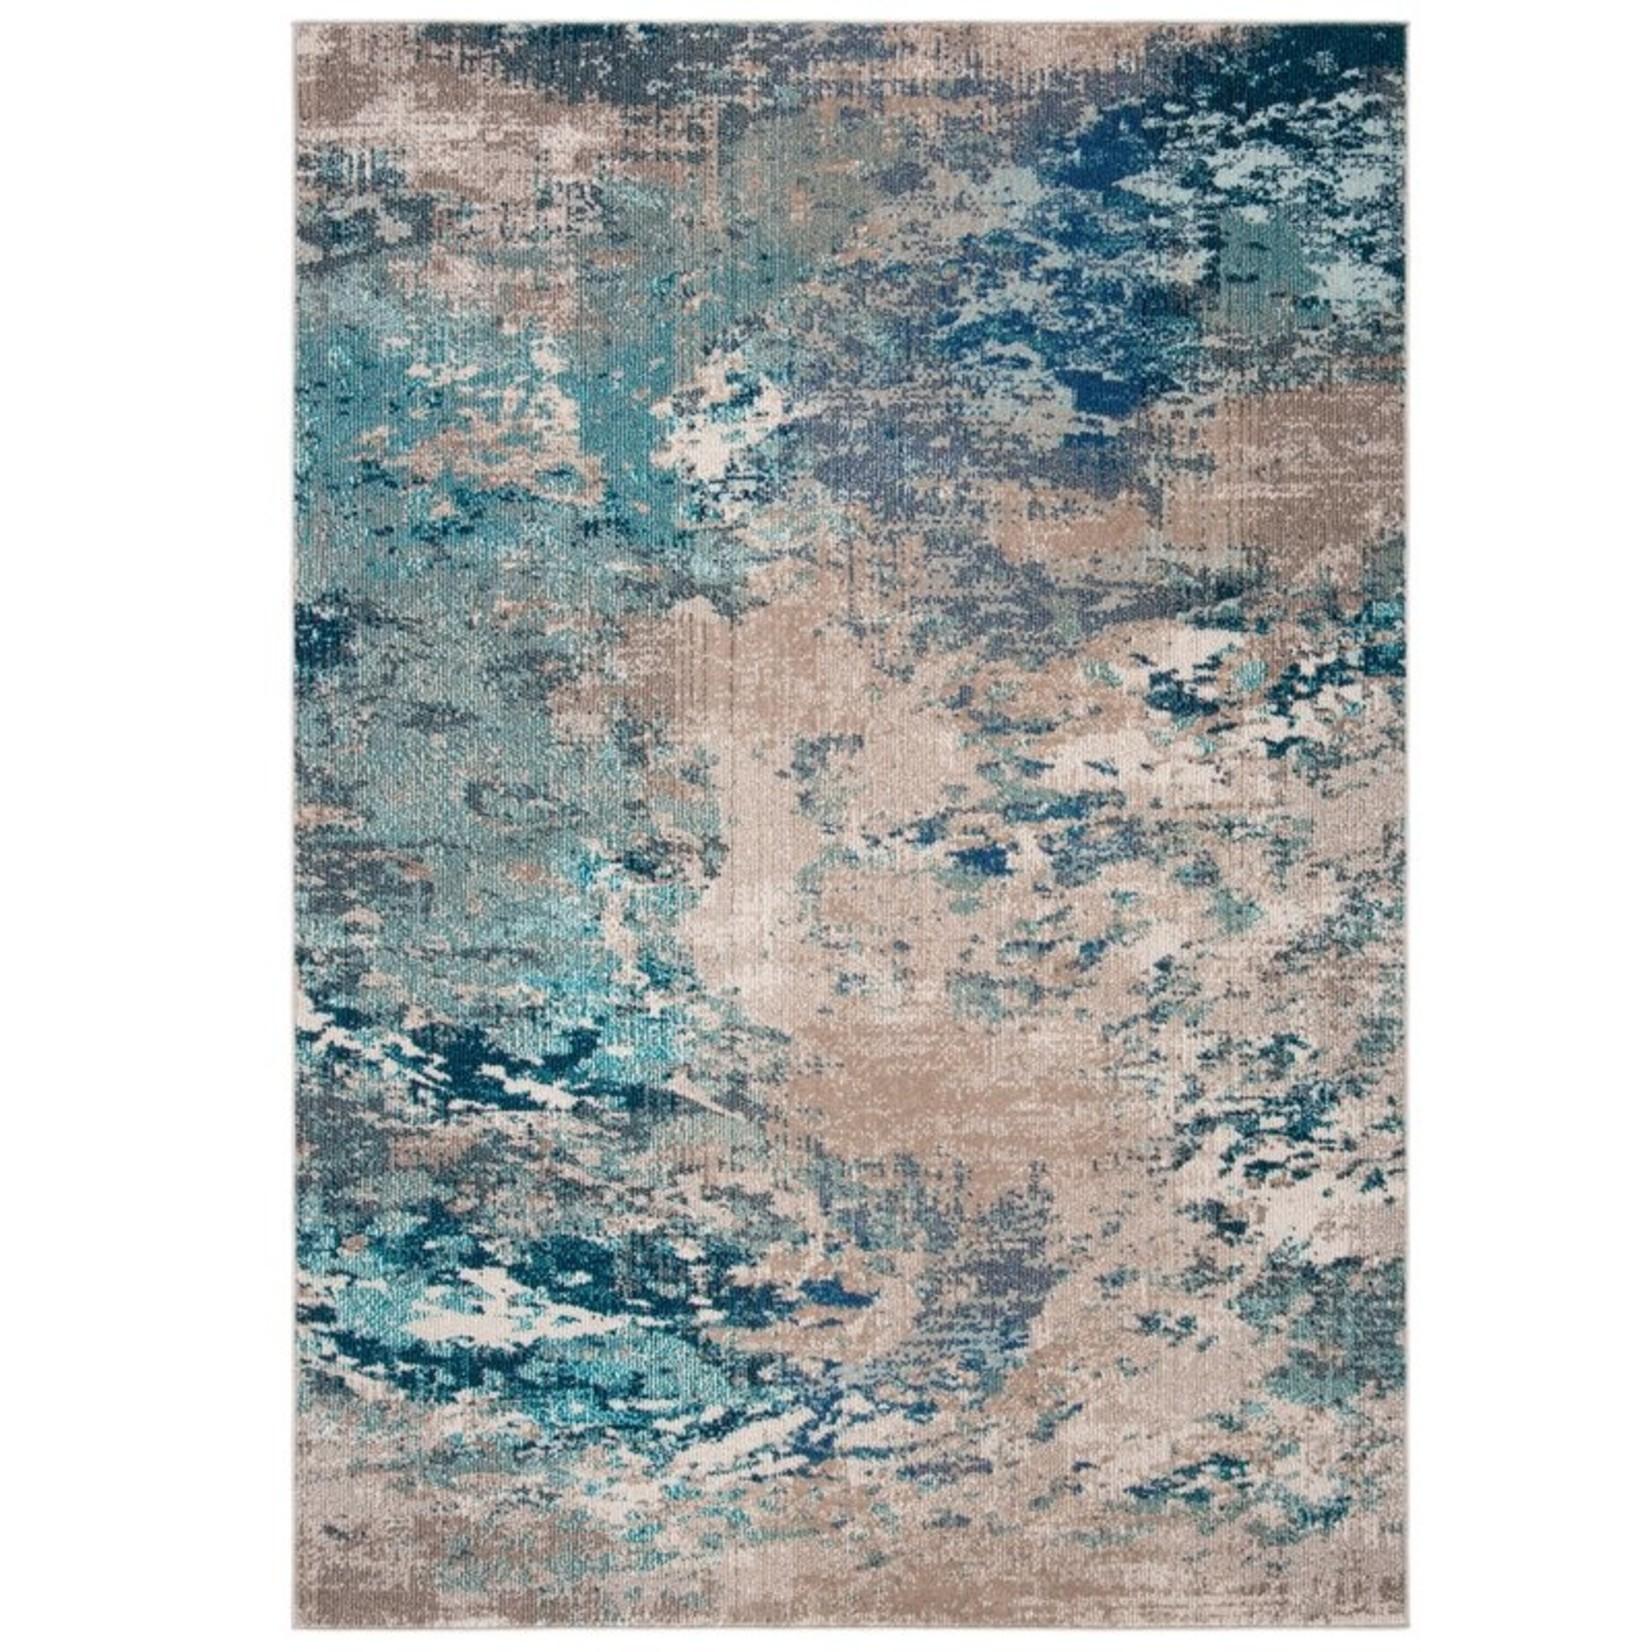 *12' x 18' - Abderus Abstract Blue/Gray Area Rug